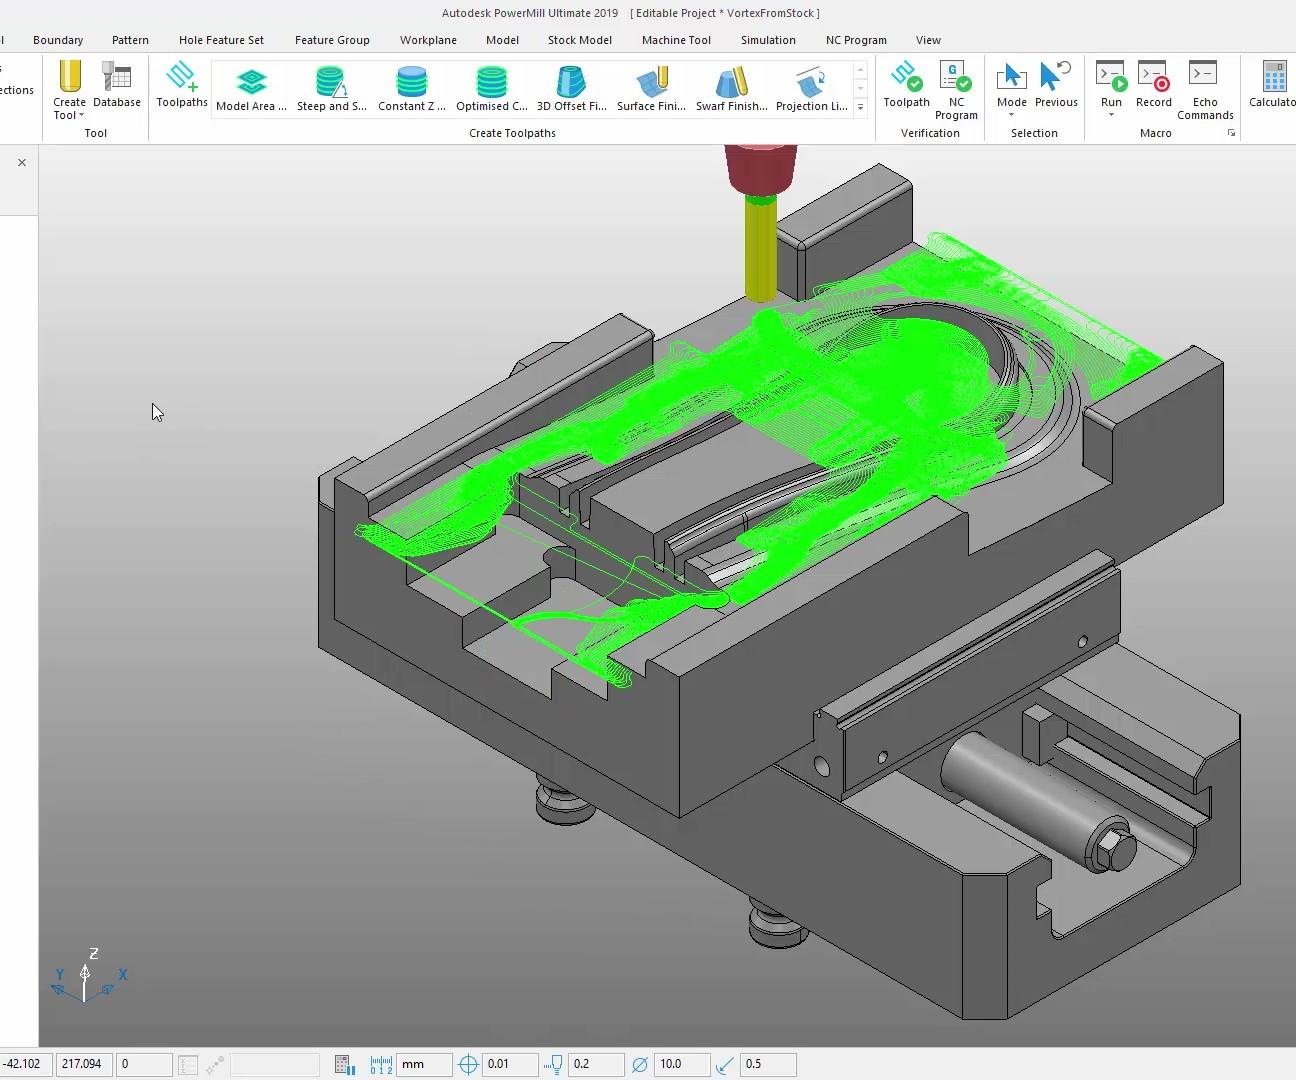 Autodesk PowerMill screenshot